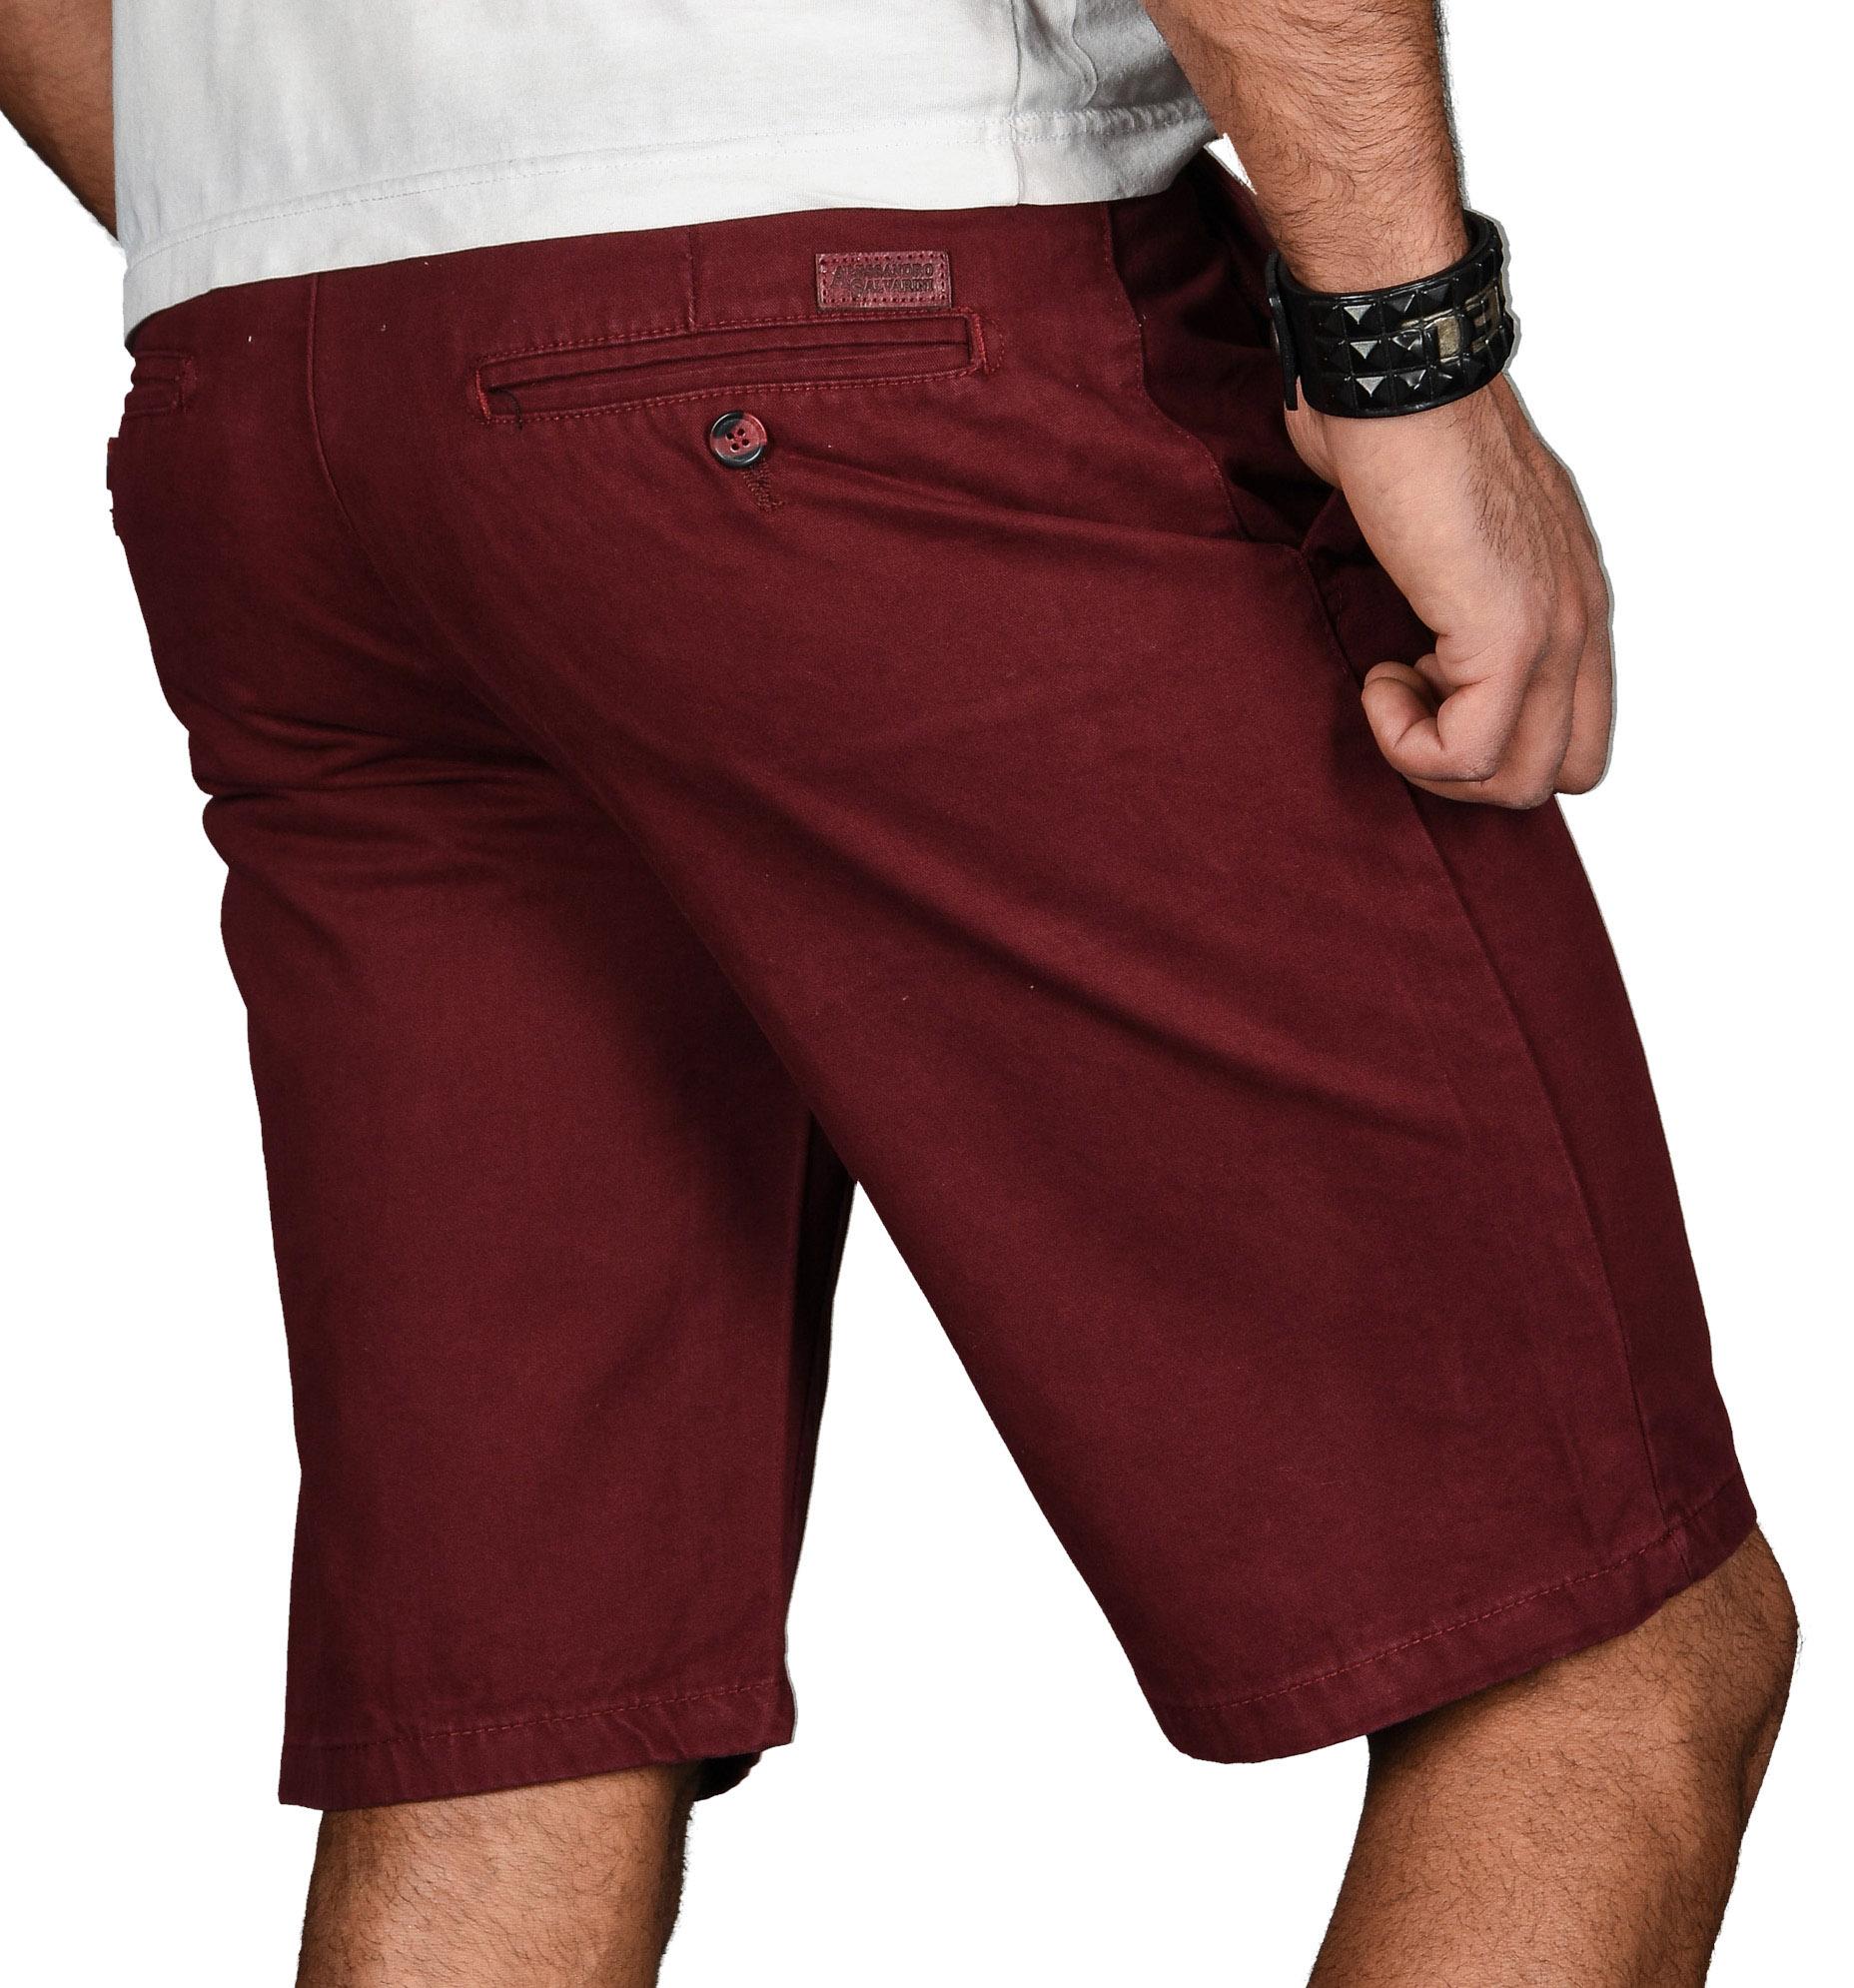 A-Salvarini-Herren-Shorts-kurze-Sommer-Hose-mit-Guertel-Short-Bermuda-NEU-AS096 Indexbild 34